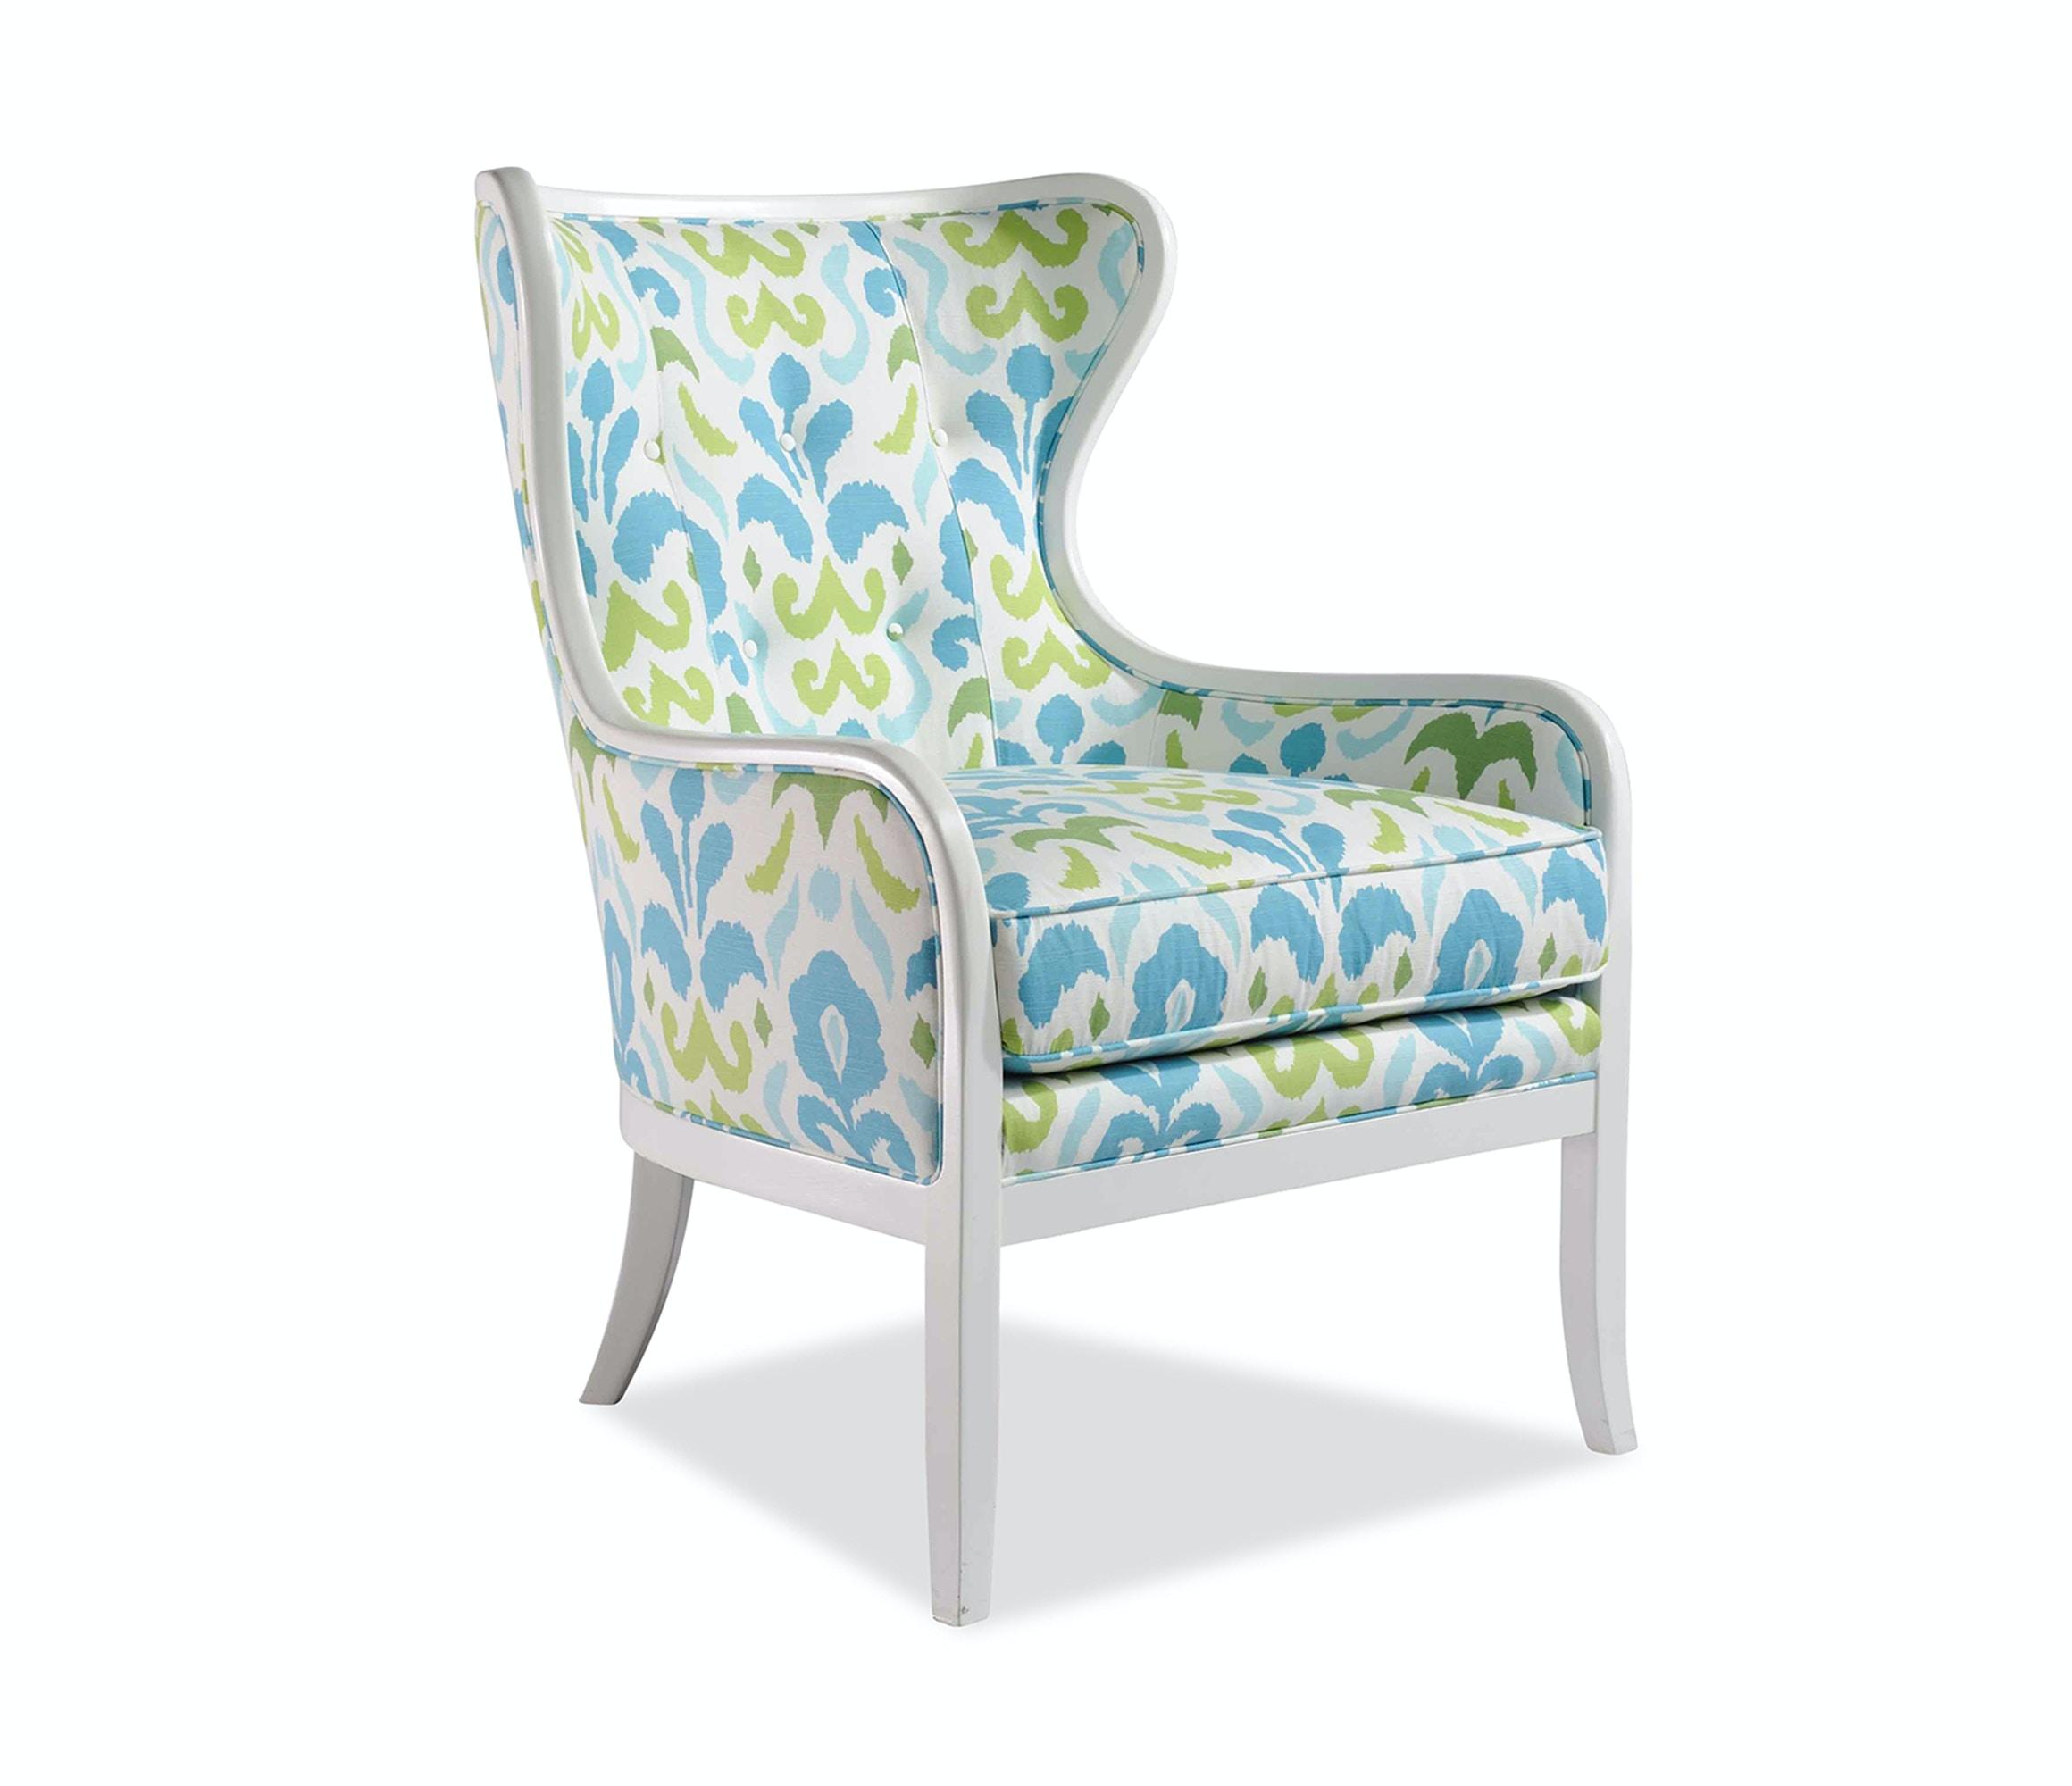 1214 01. Gavin Chair